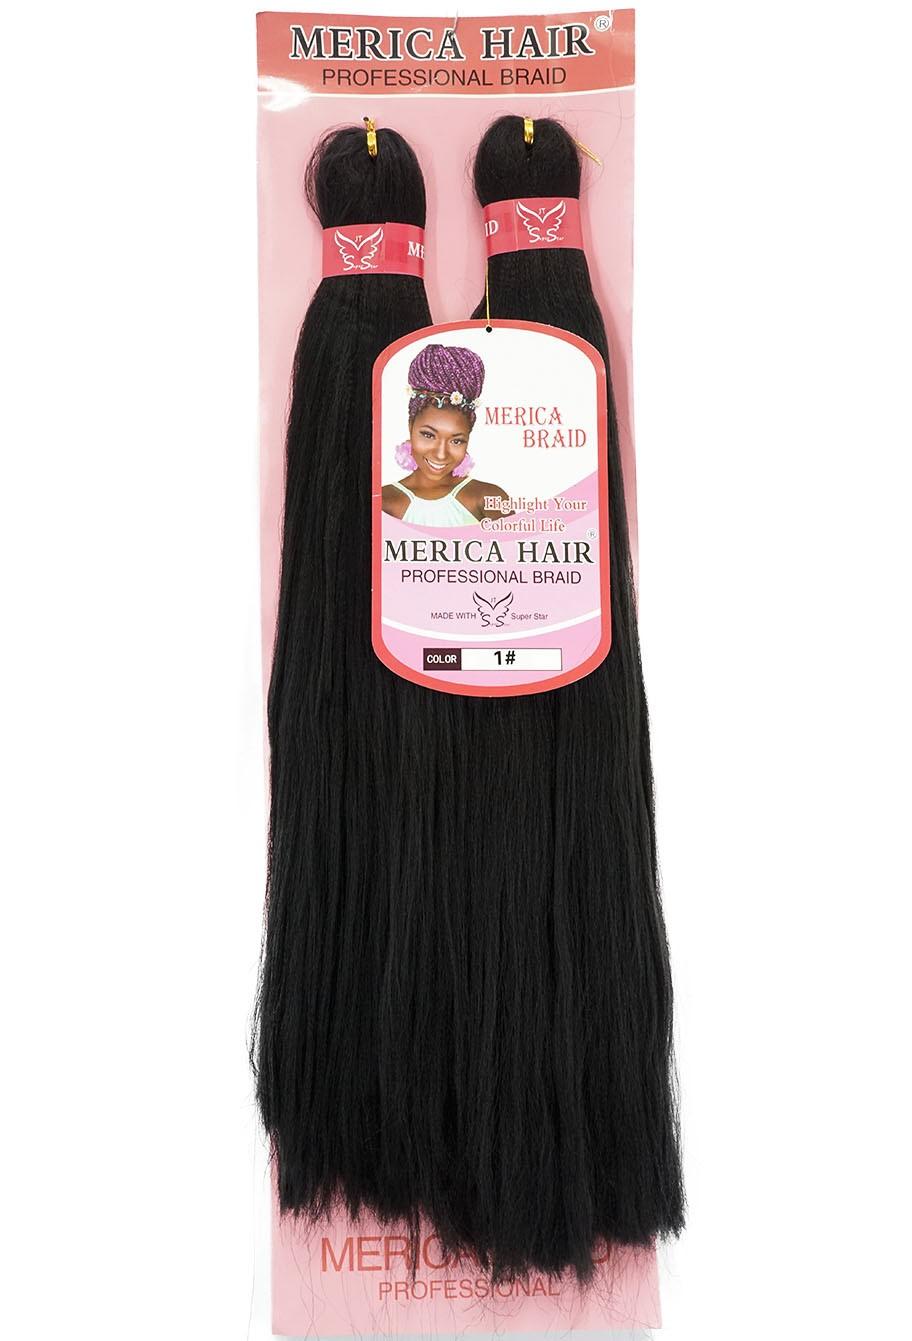 Jumbo - Merica Hair (146G) - Cor: Preto (1B)